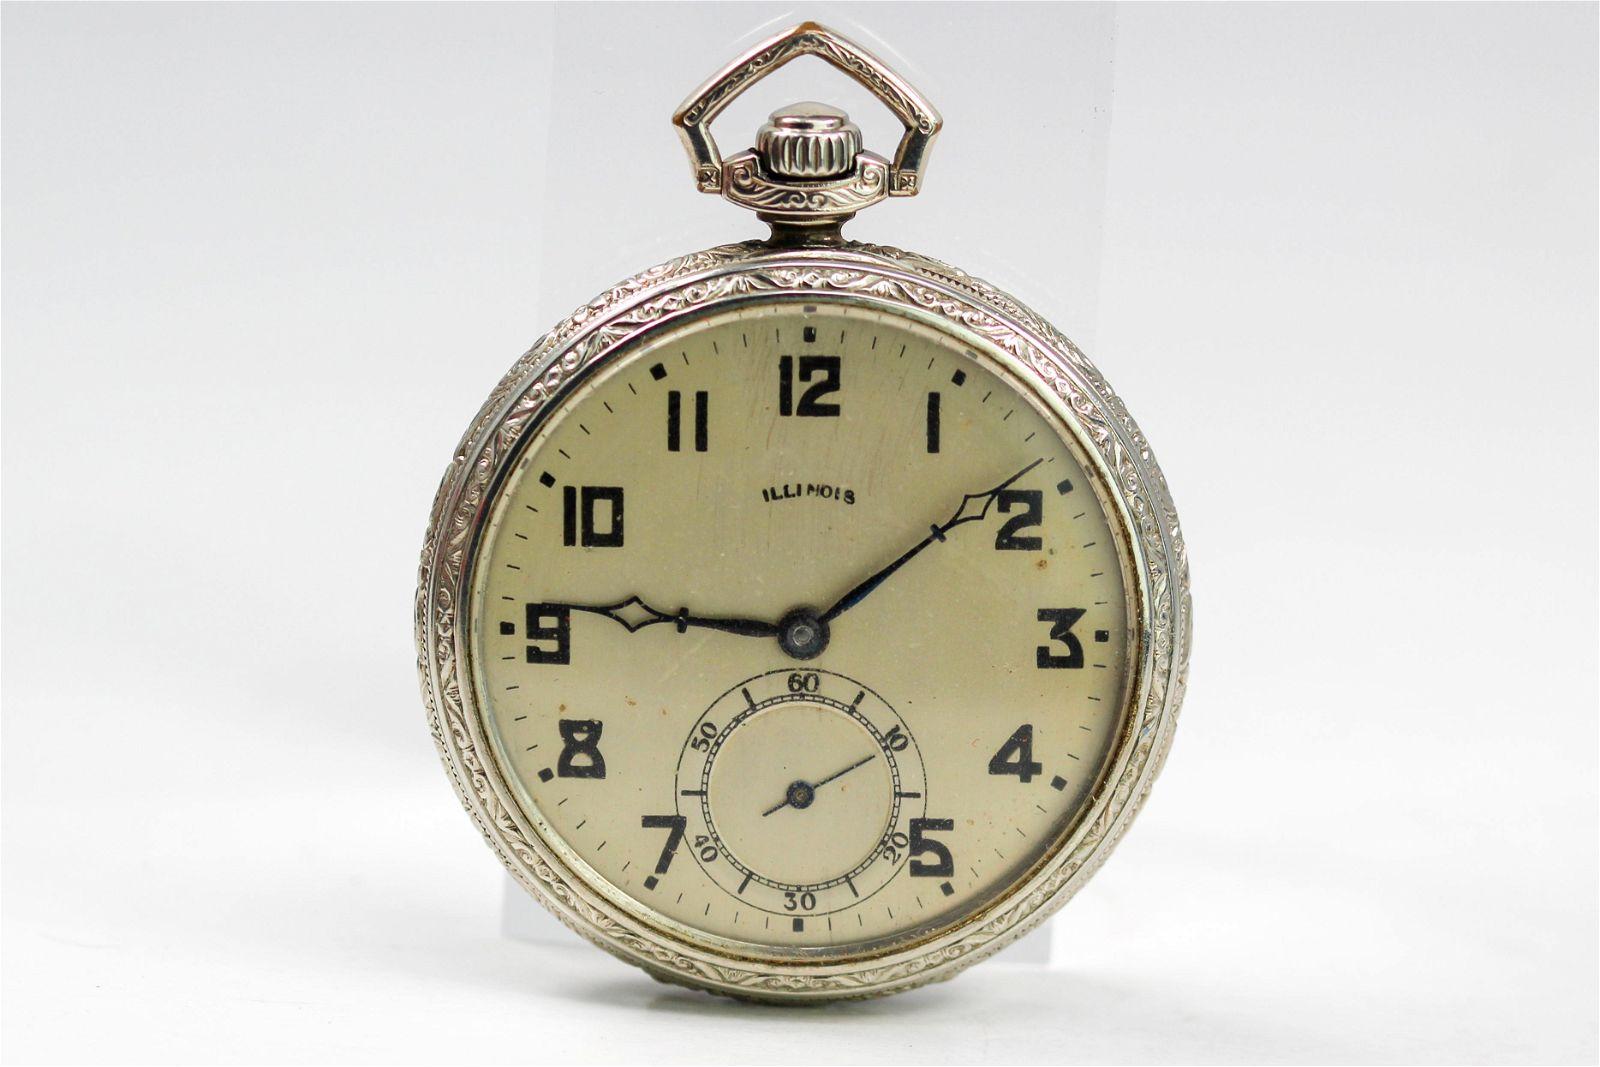 Vintage Illinois Pocketwatch in 14k Gold Filled